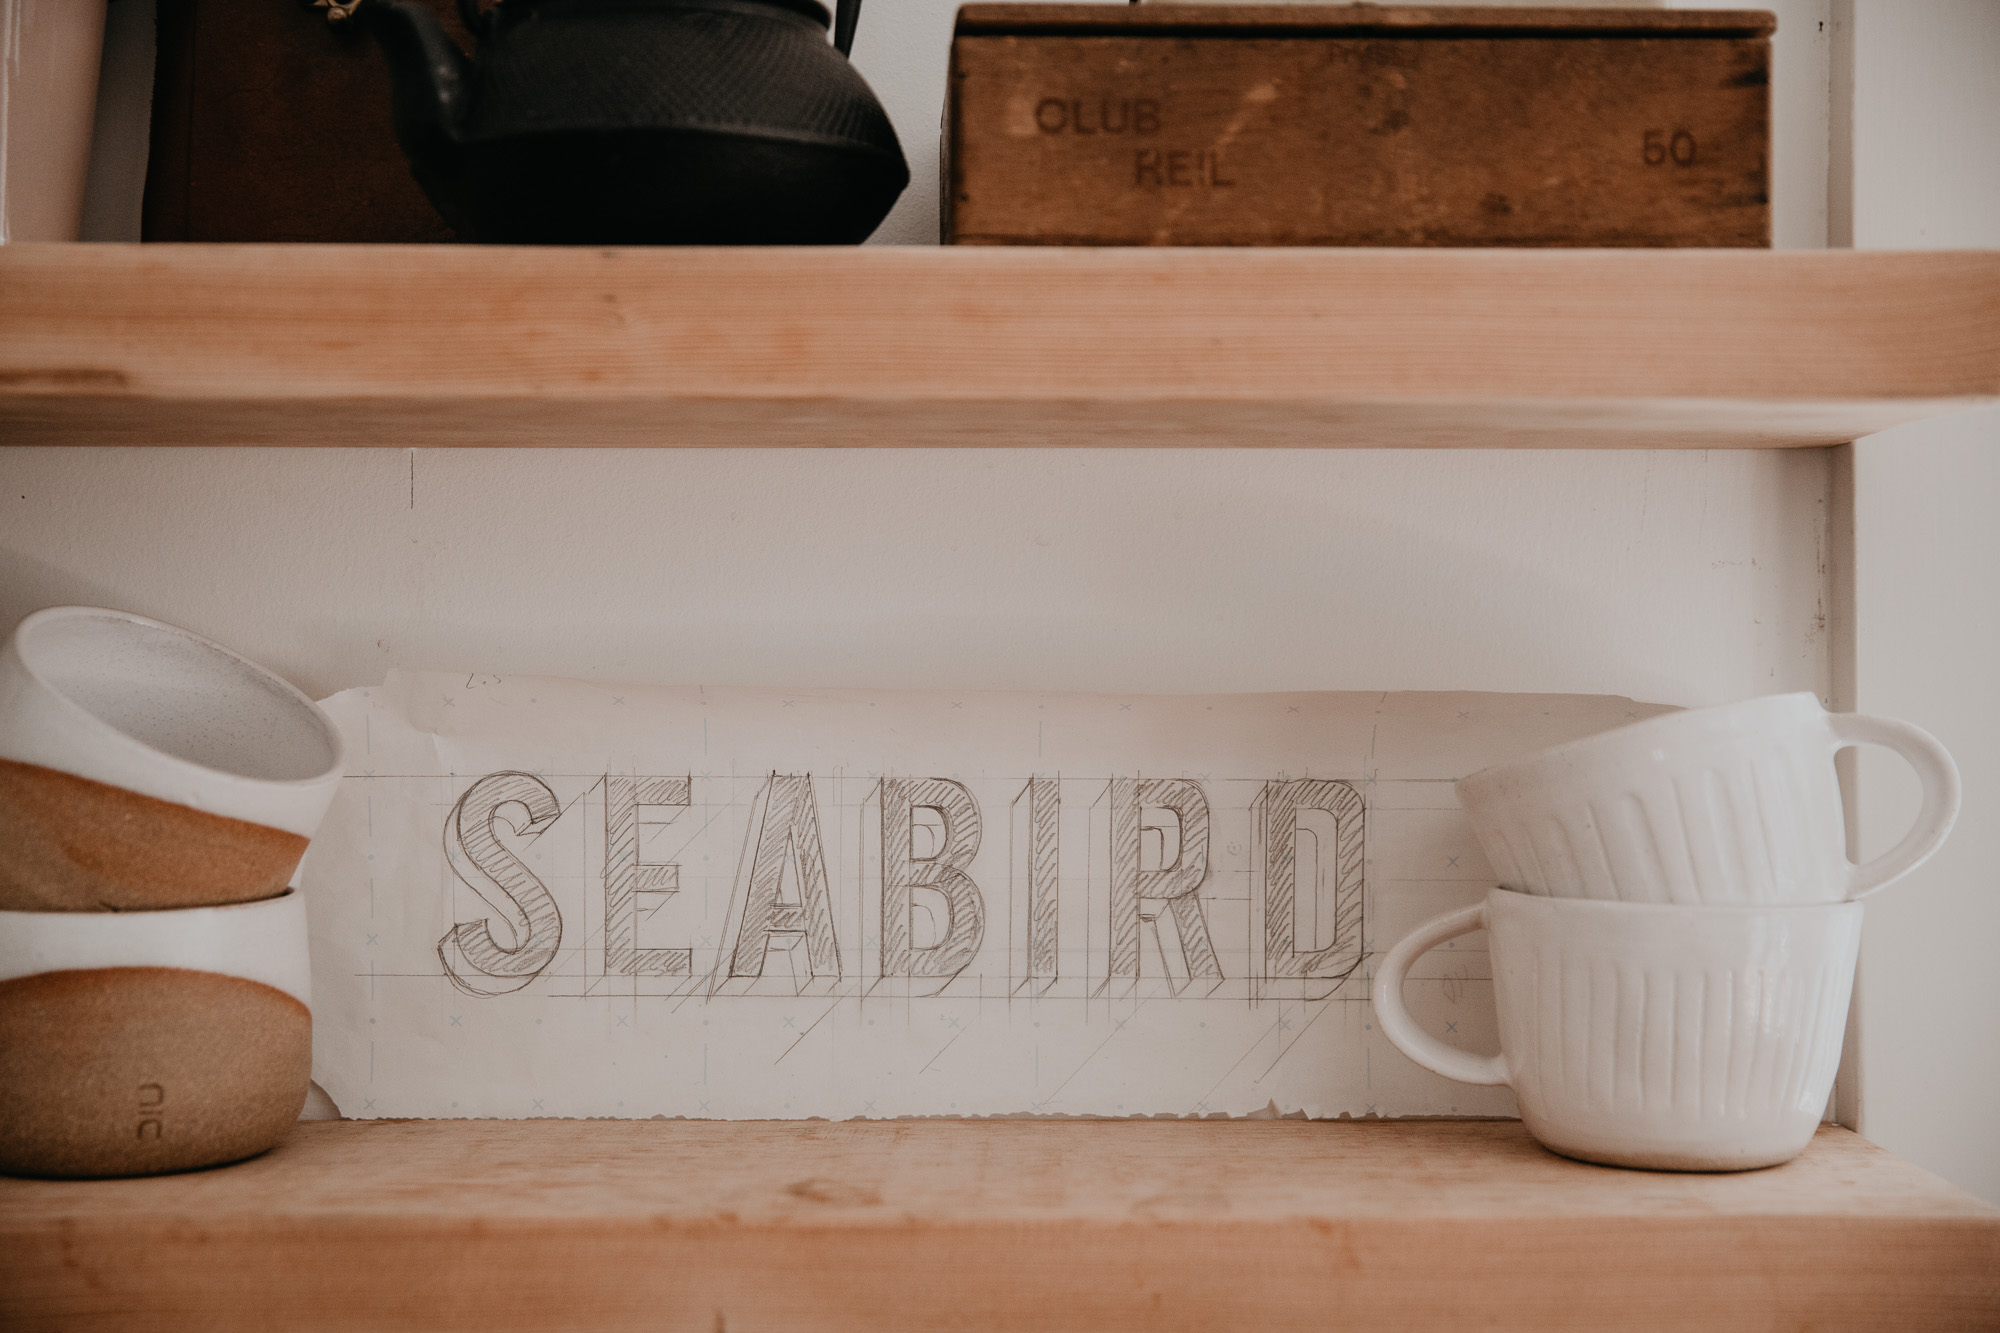 170919-Pony-Rider-Real-Living-Mag-Coasters-Seabird-672